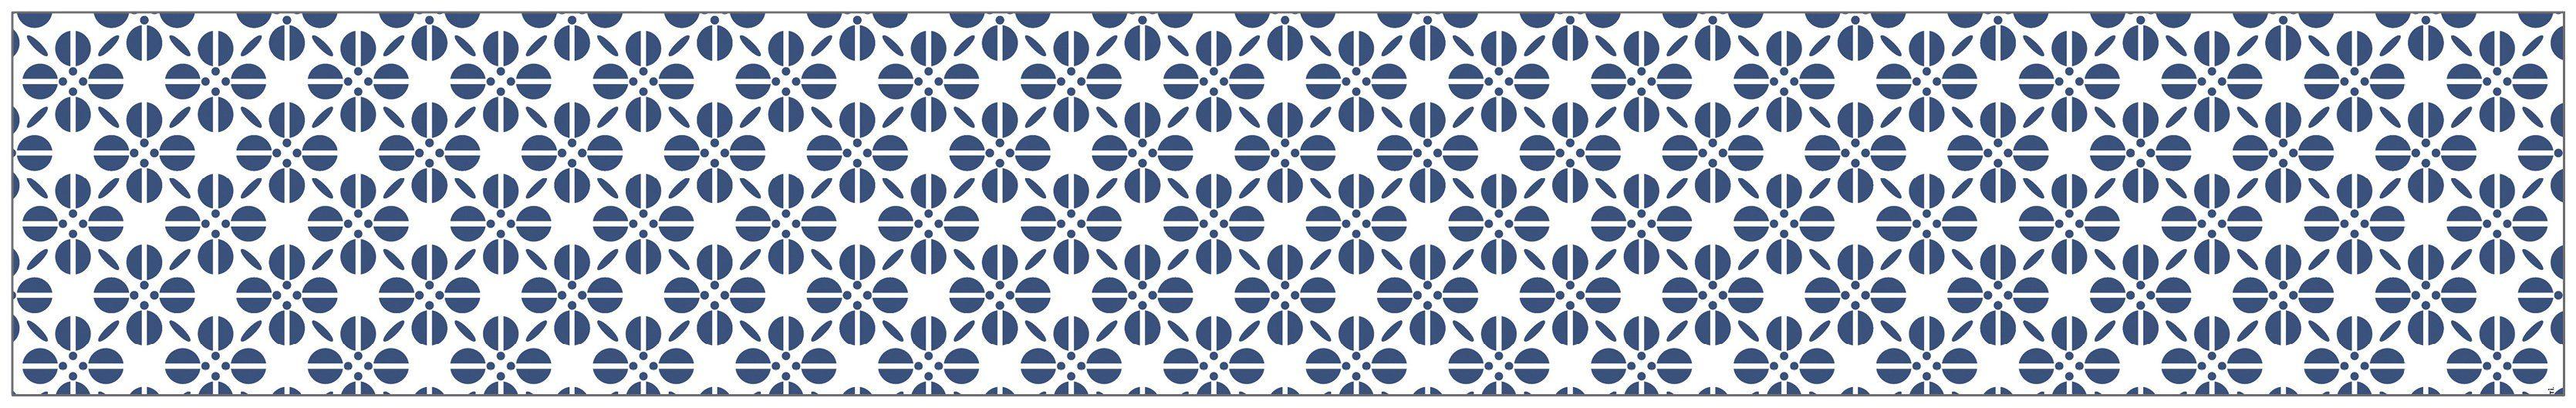 MYSPOTTI Fensterfolie »mySPOTTI look Grafik Blumenmuster blau«, 200 x 30 cm, statisch haftend